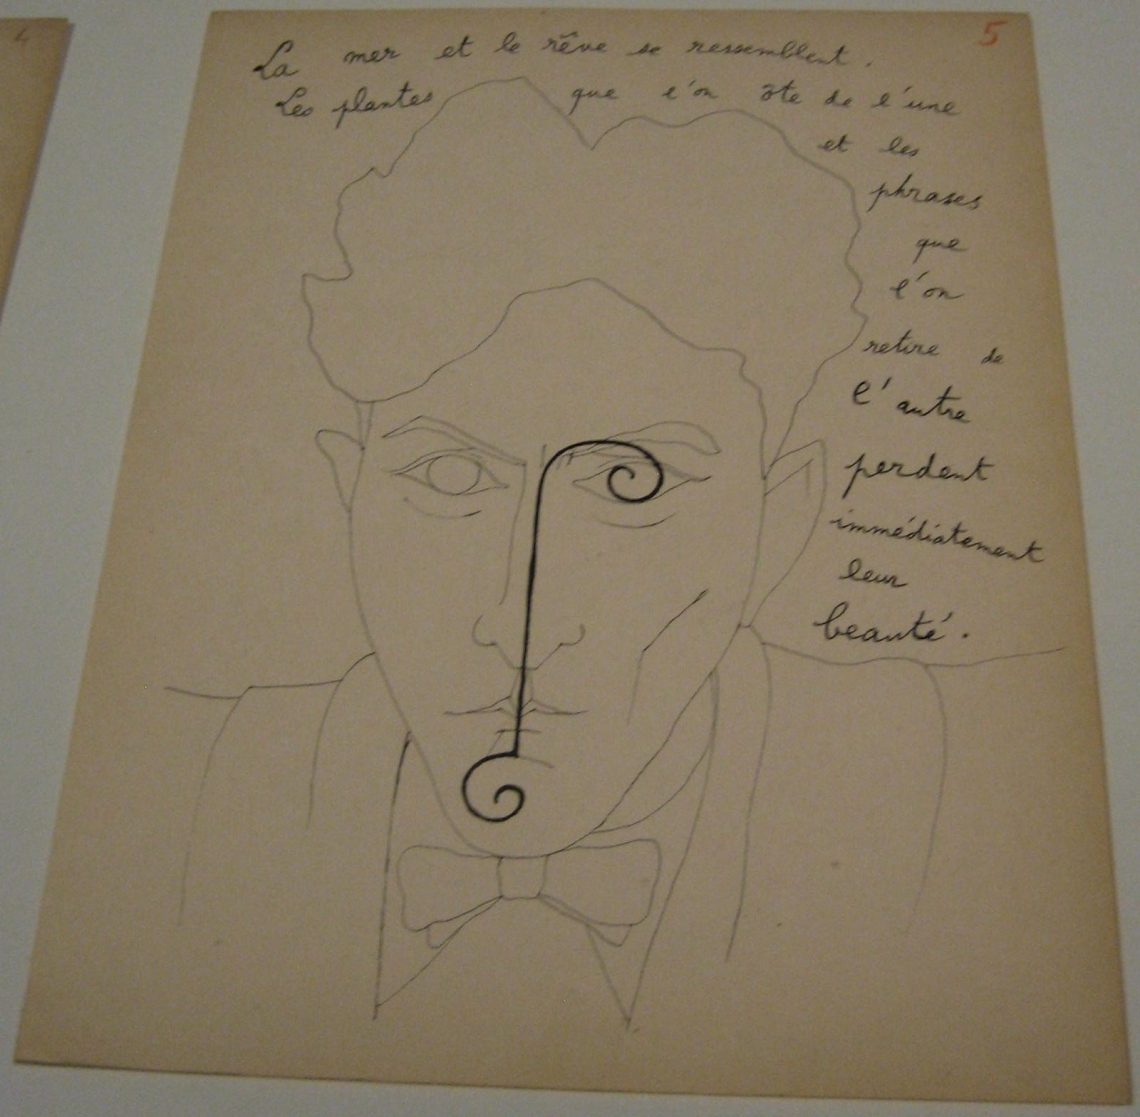 Jean Cocteau, zelfportret. Foto Esther Doornbusch, 2 december 2018, CC BY 4.0